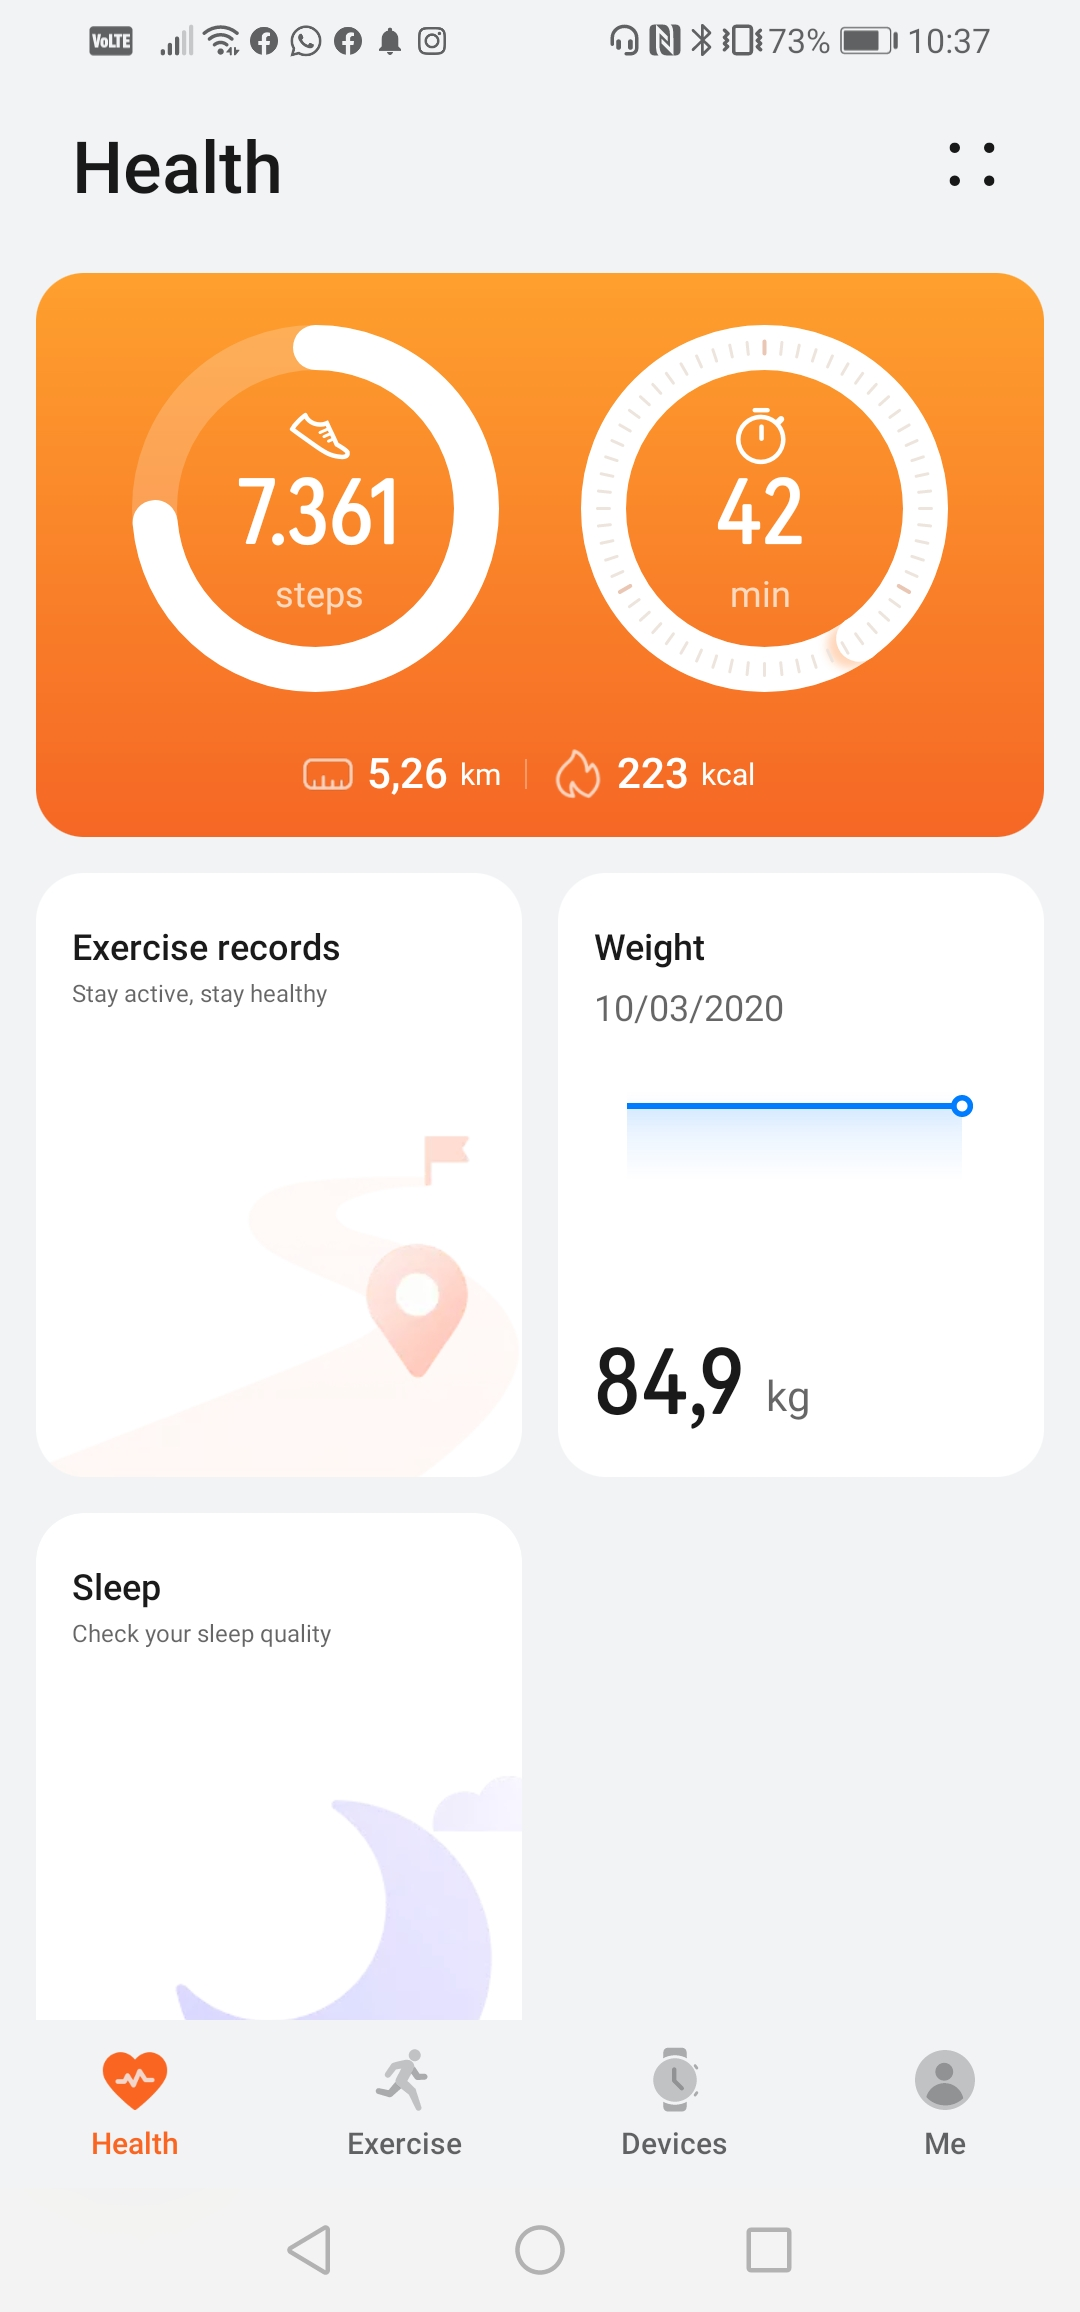 screenshot_20210510_103738_com-huawei-health_0